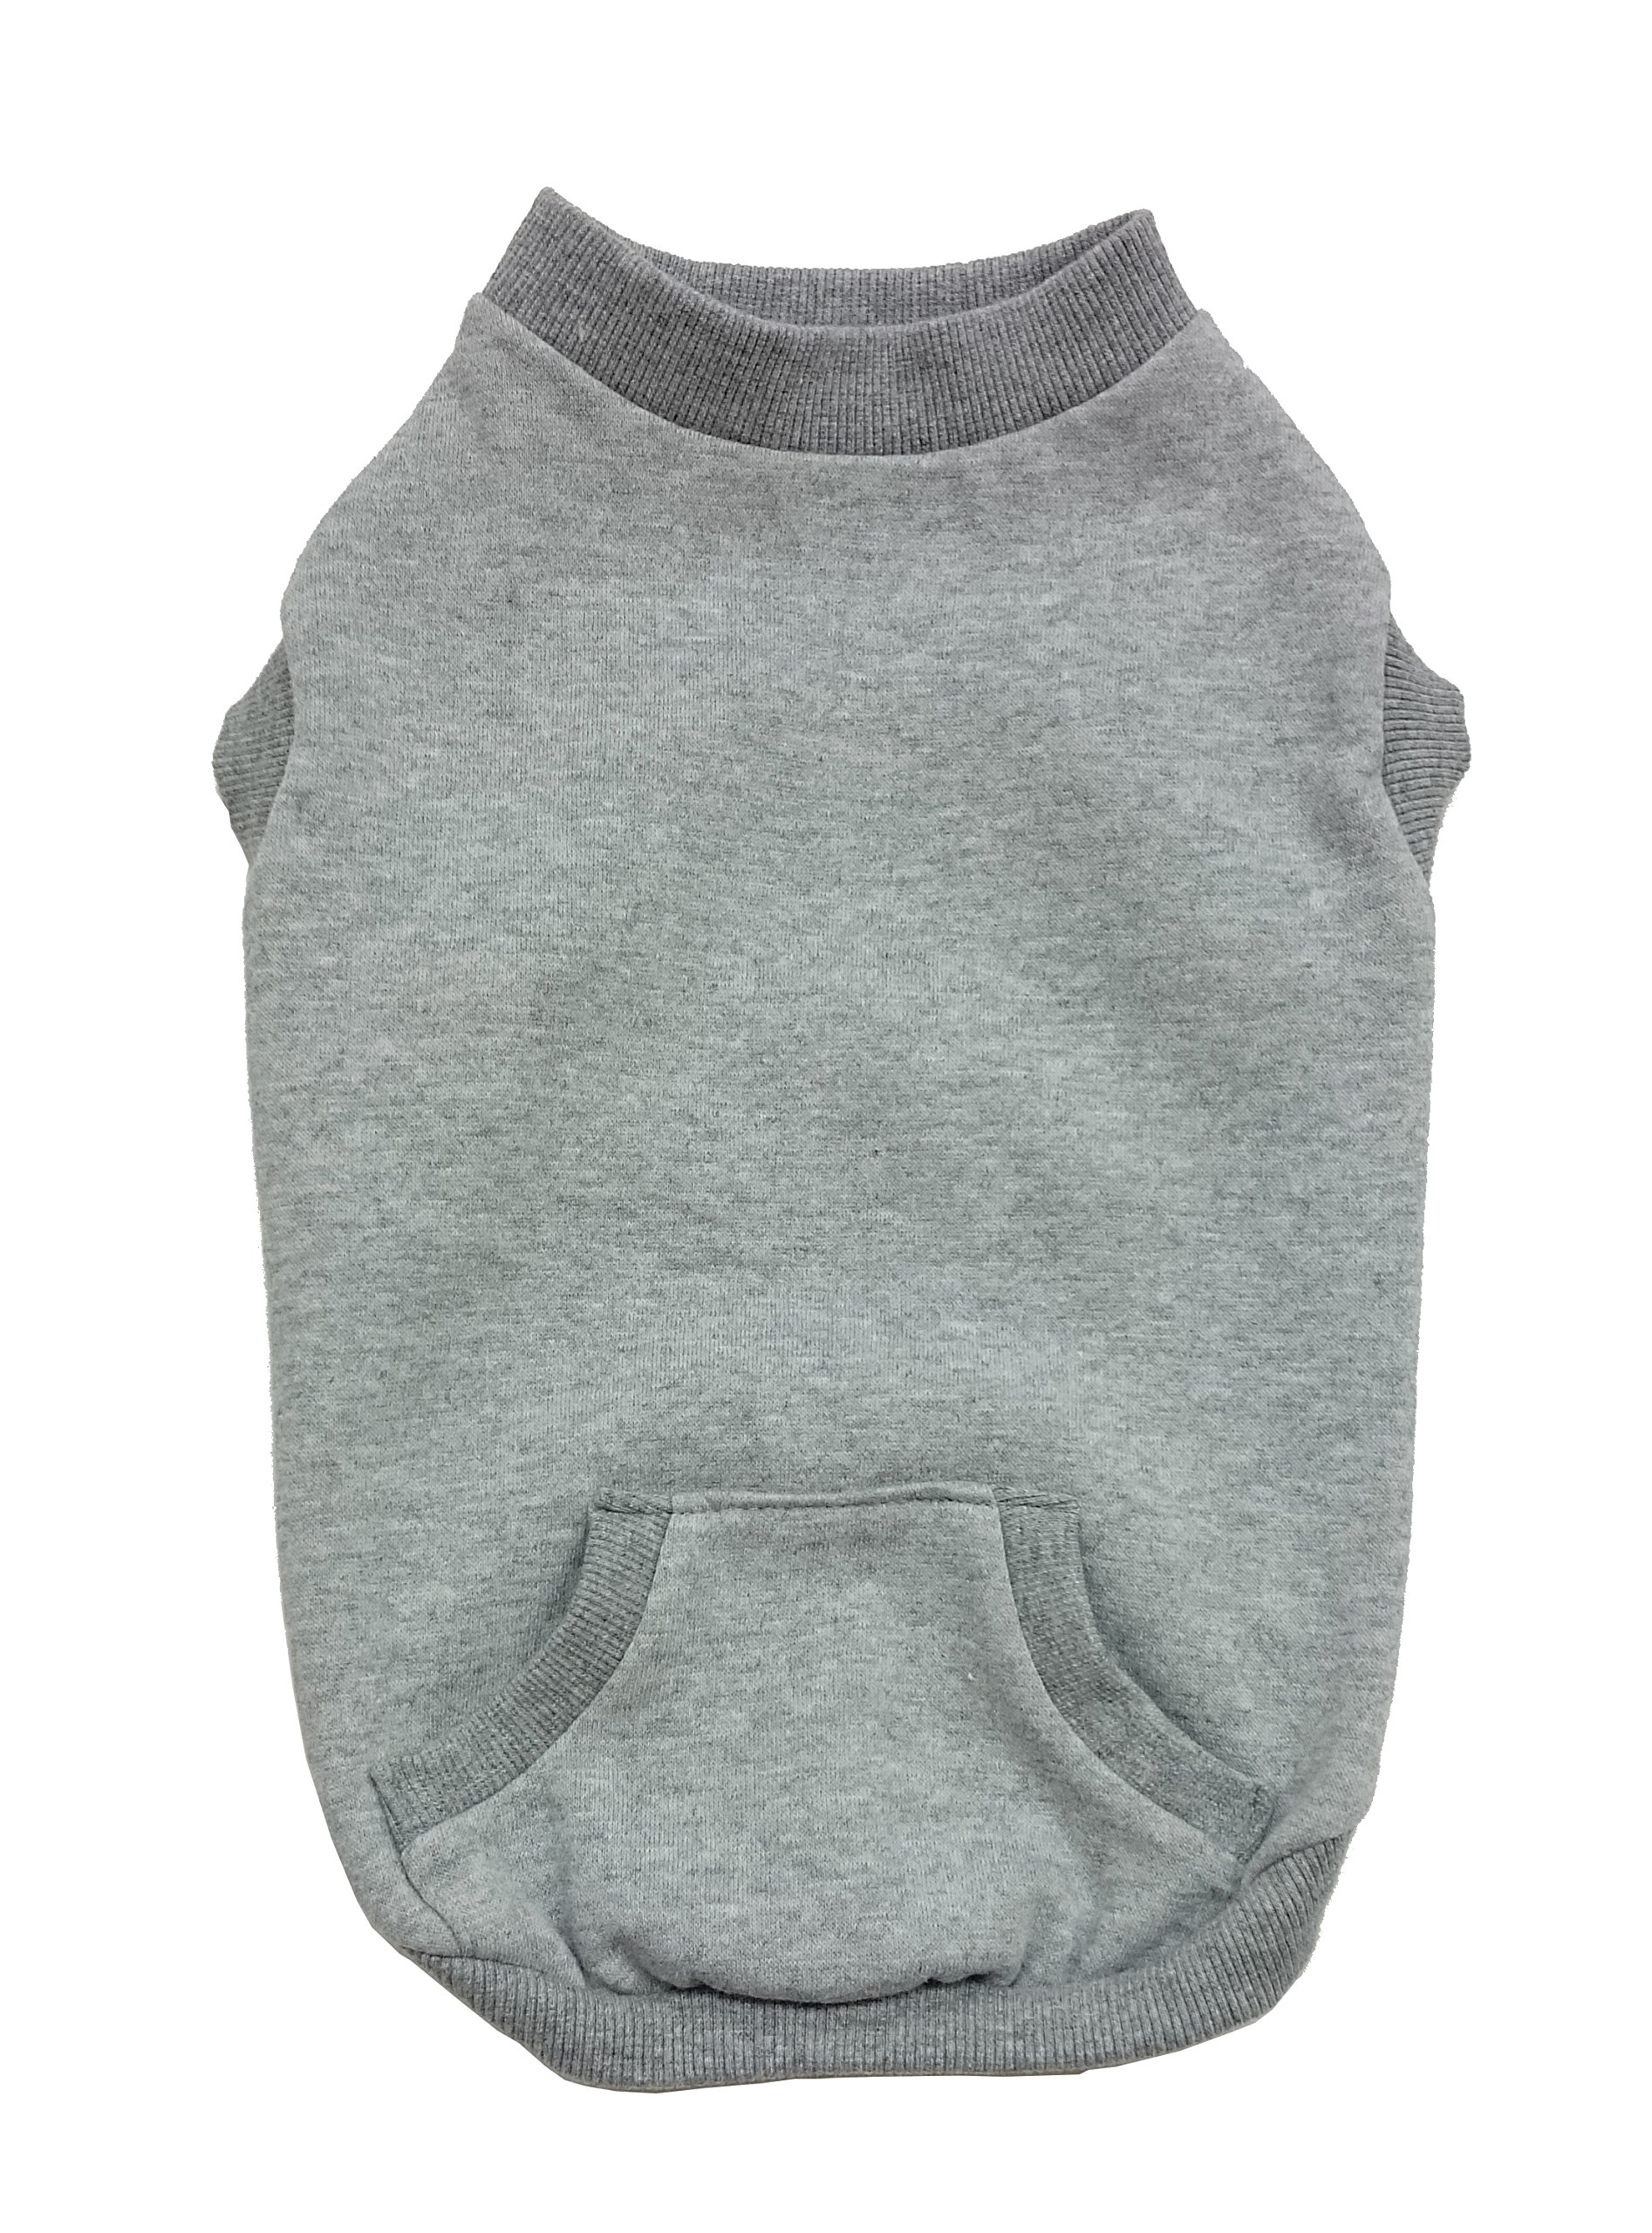 Fashion Pet 550666 Gray Outdoor Dog Sweatshirt, Large